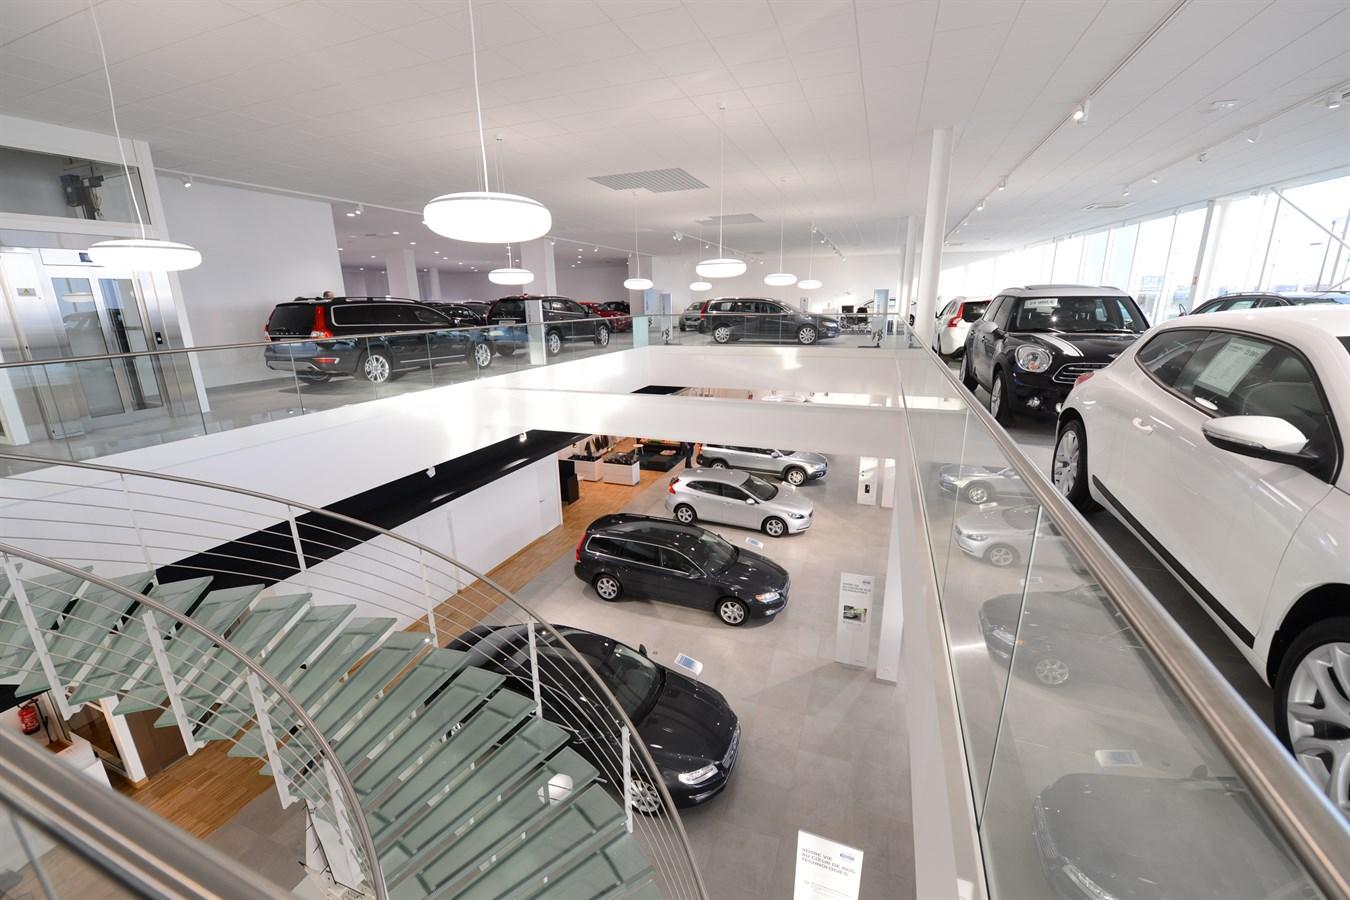 New Volvo Xc90 >> INAUGURATION D'UNE NOUVELLE CONCESSION VOLVO AUX NORMES ...